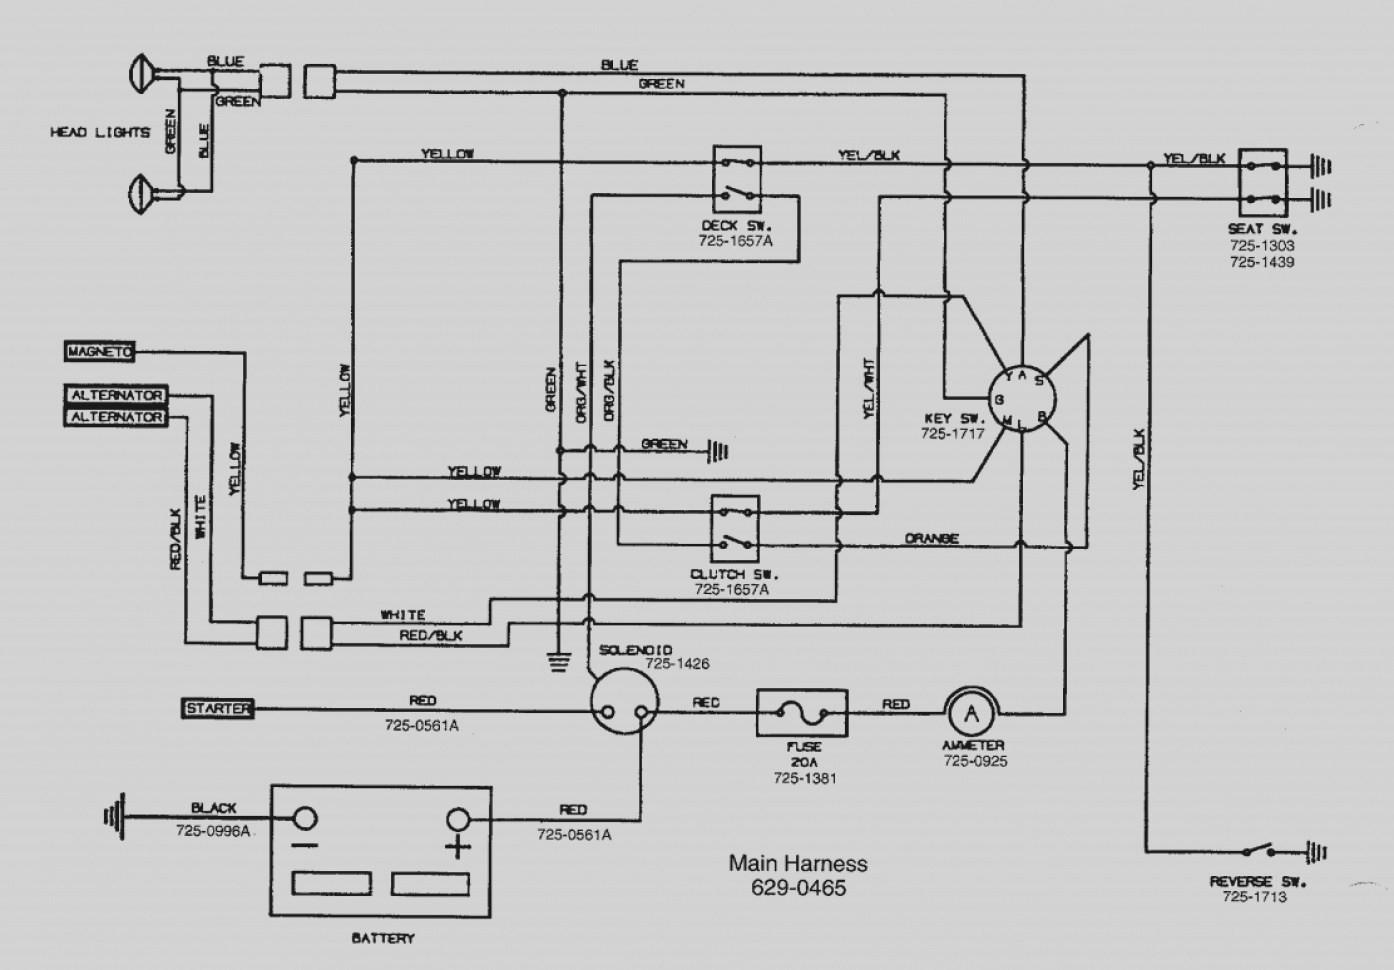 TY_3492] Free Mtd Wiring Schematics Free Pdf Files Schematic WiringAeocy Vesi Odga Gray Ophag Numap Mohammedshrine Librar Wiring 101